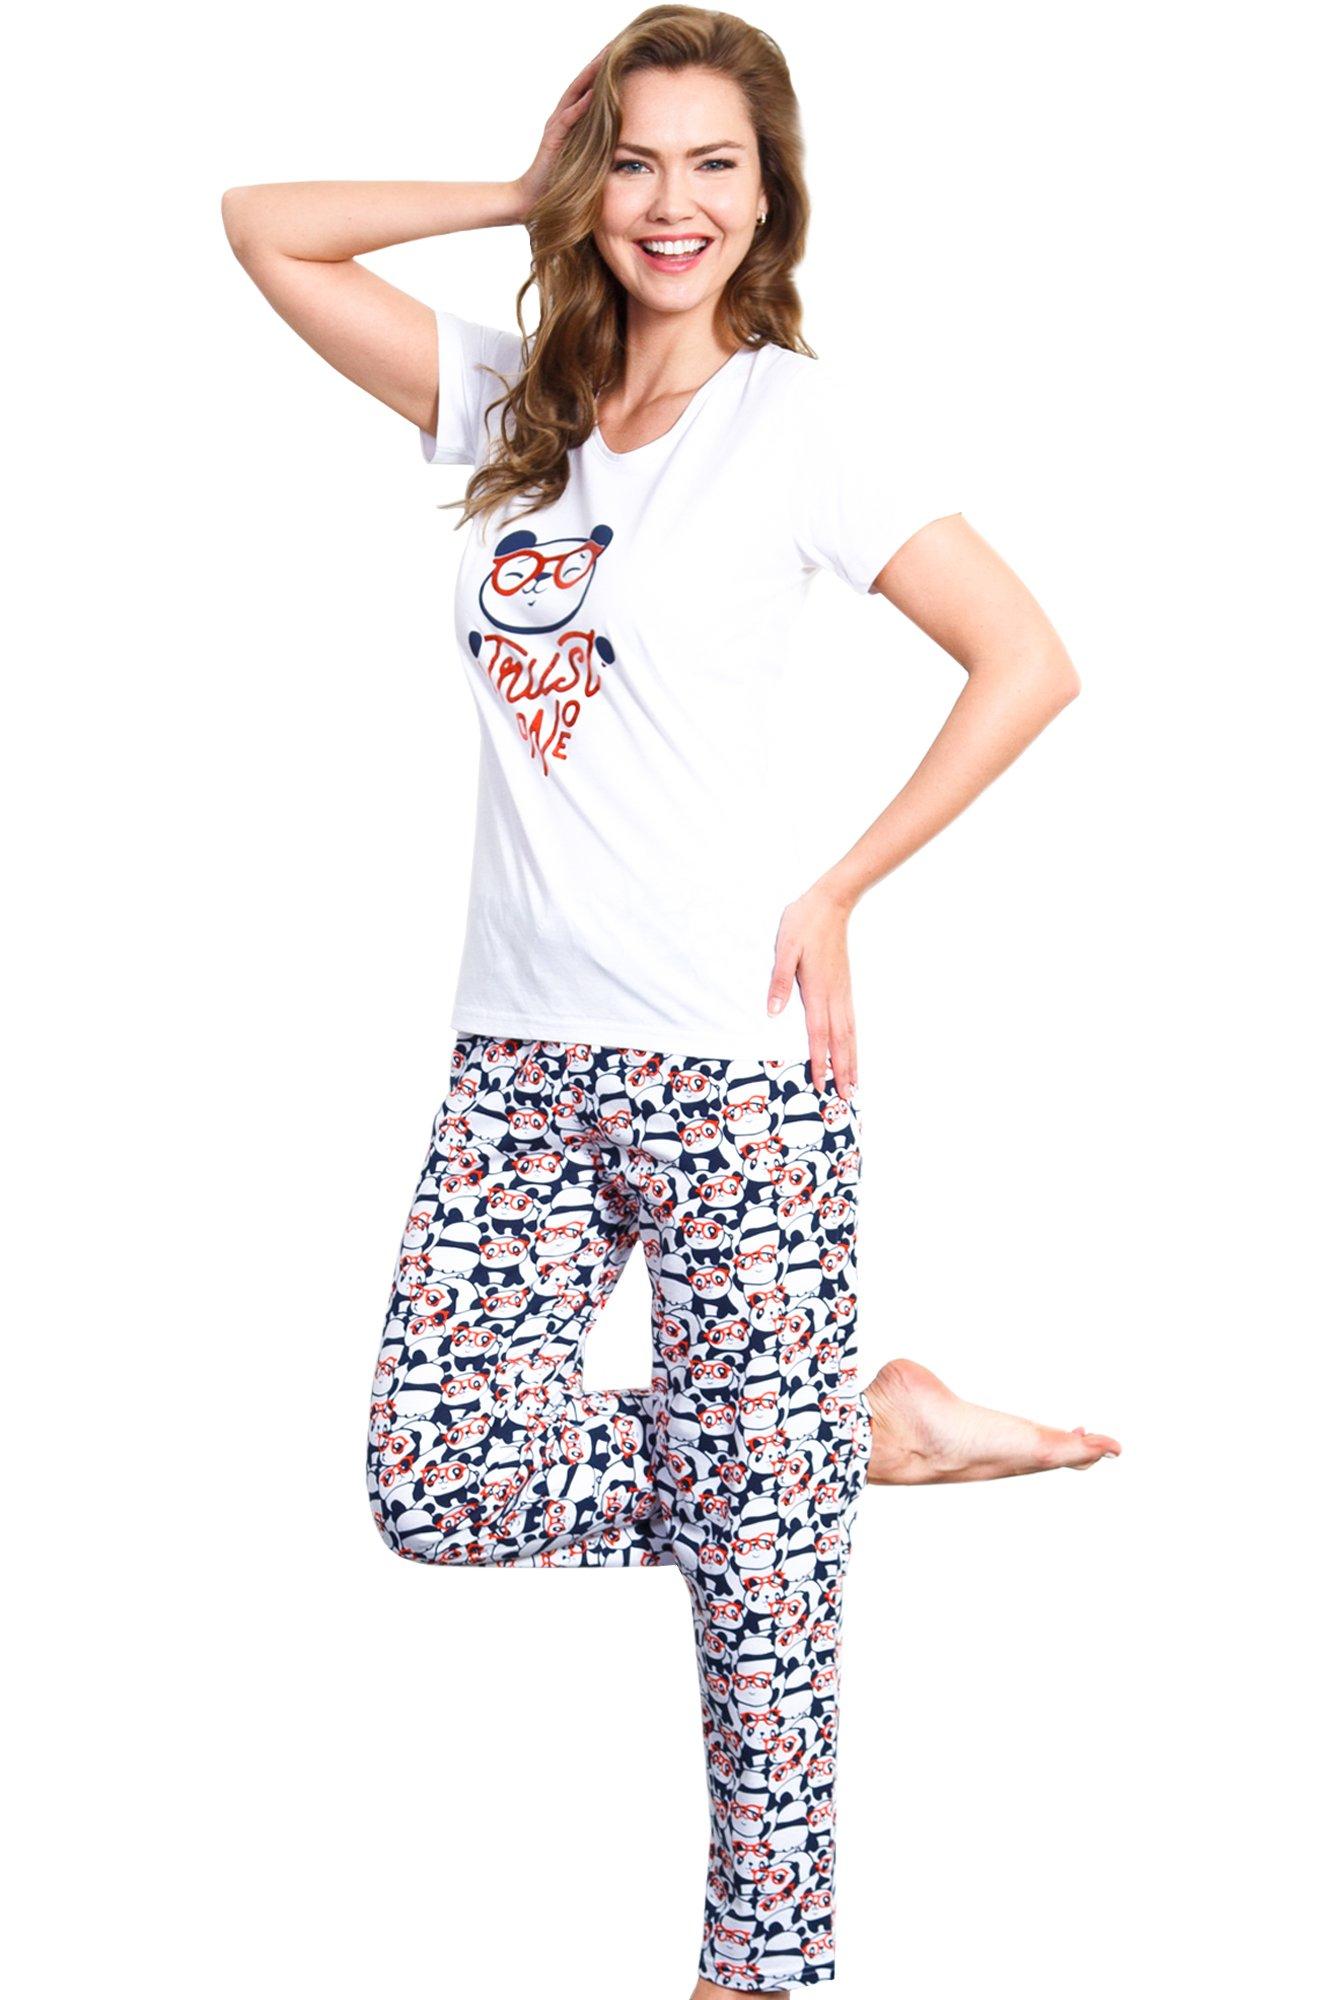 Пижама Vienetta Secret купить оптом в интернет-магазине Happywear.ru 0bb9ae06b9751